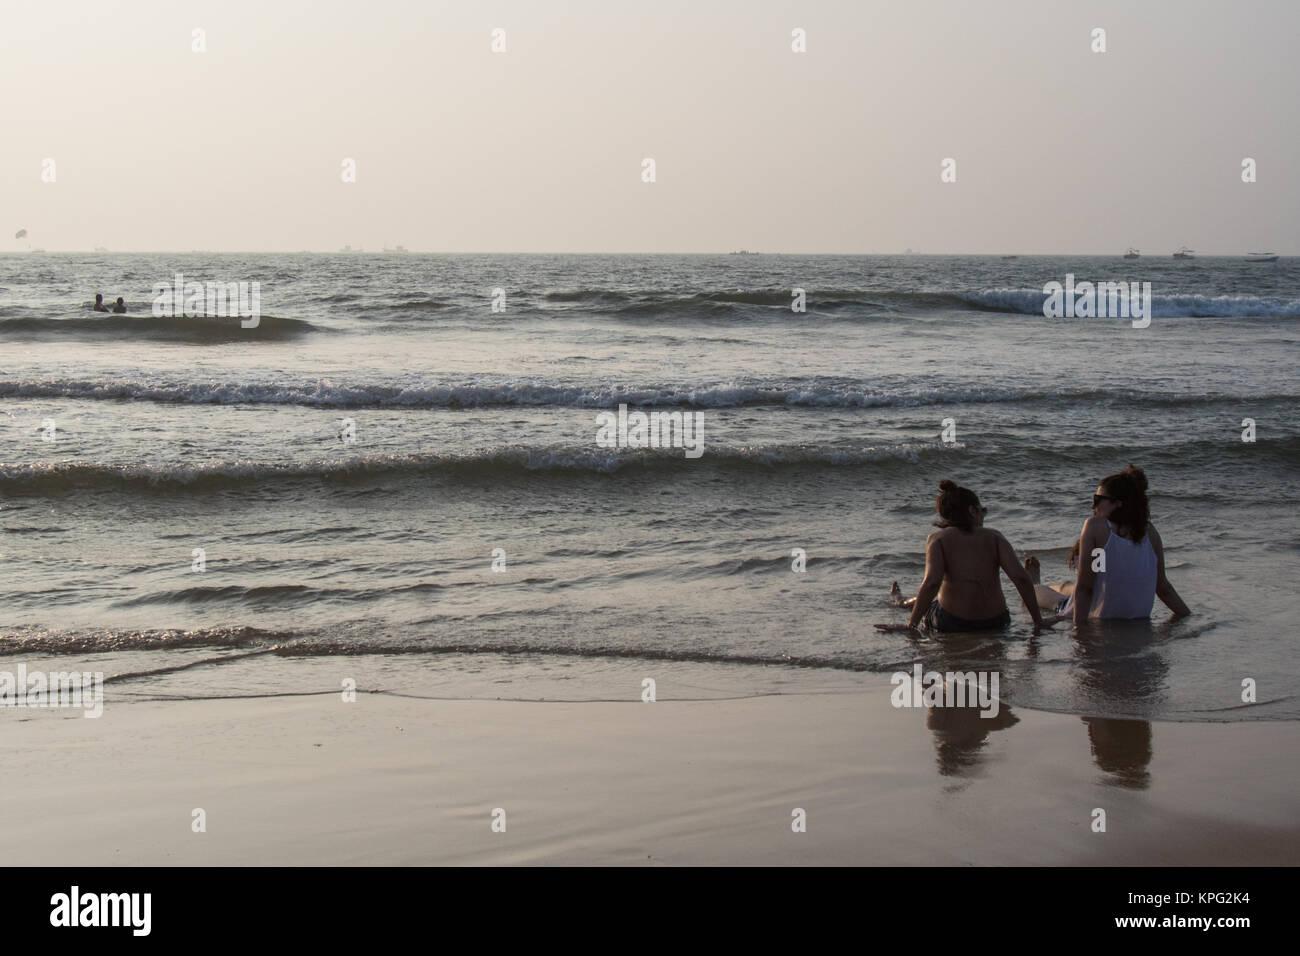 Tourists enjoying in waters at Calangute beach, Goa - Stock Image